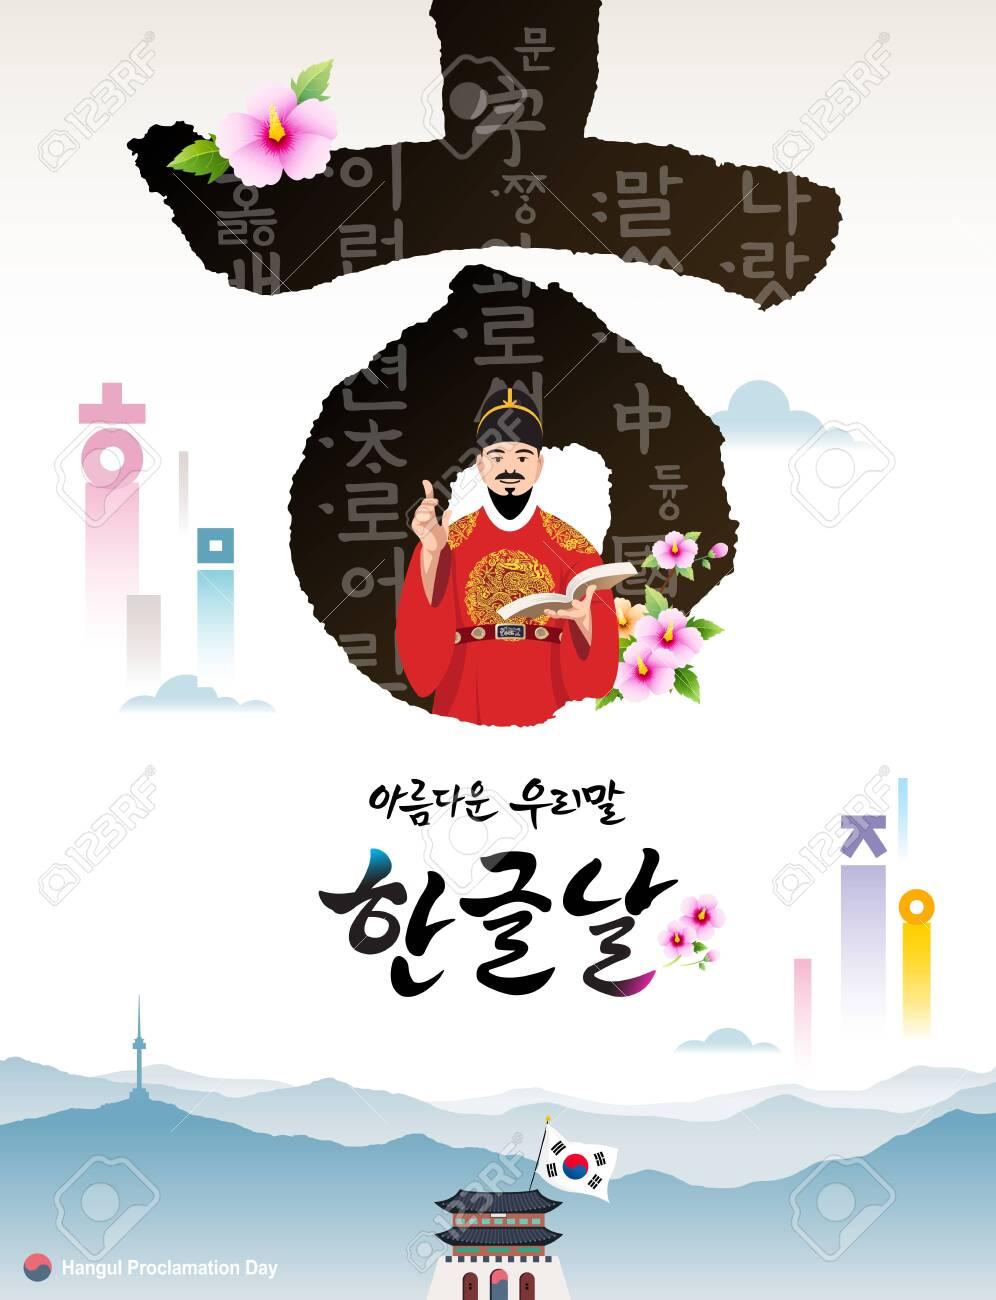 Hangul Proclamation Day. Traditional palace, mountain landscape, king sejong, hunminjeongeum concept design. Beautiful Korean, Hangul Proclamation Day, Korean Translation. - 143928136